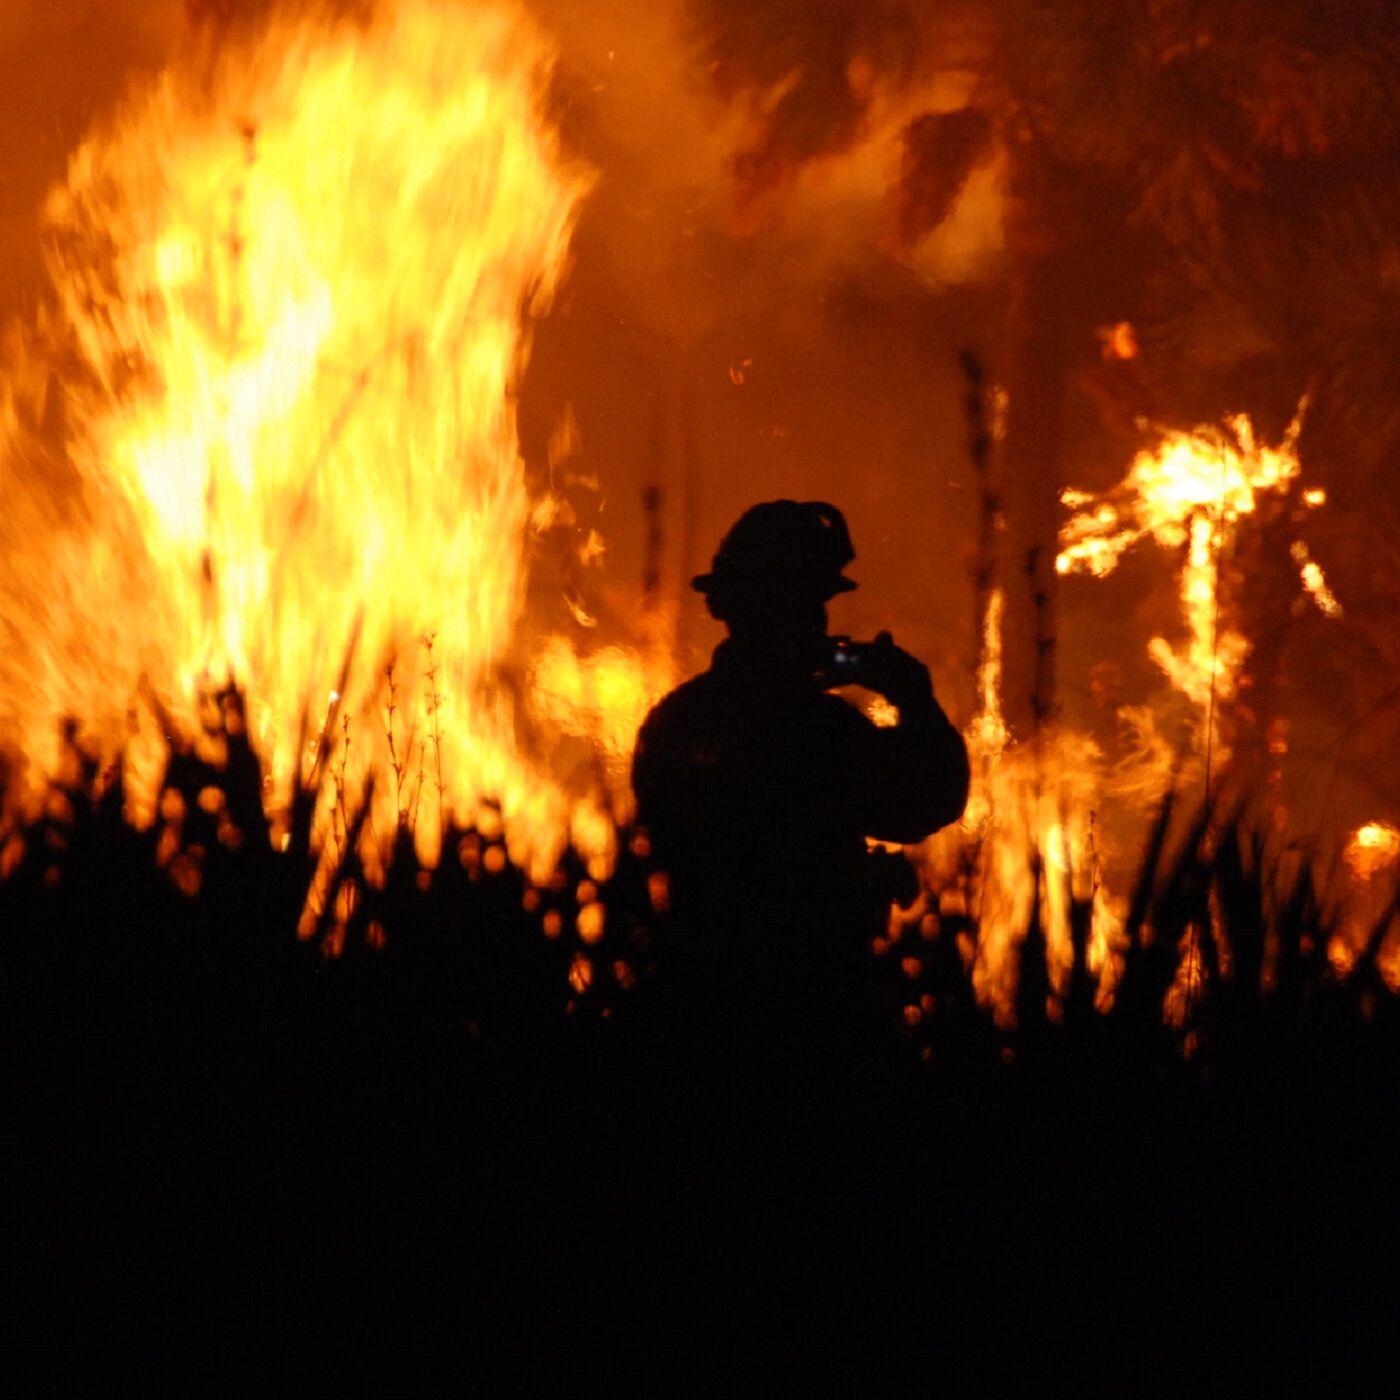 2020 Fire Season: Grim, Smoky, Flexible